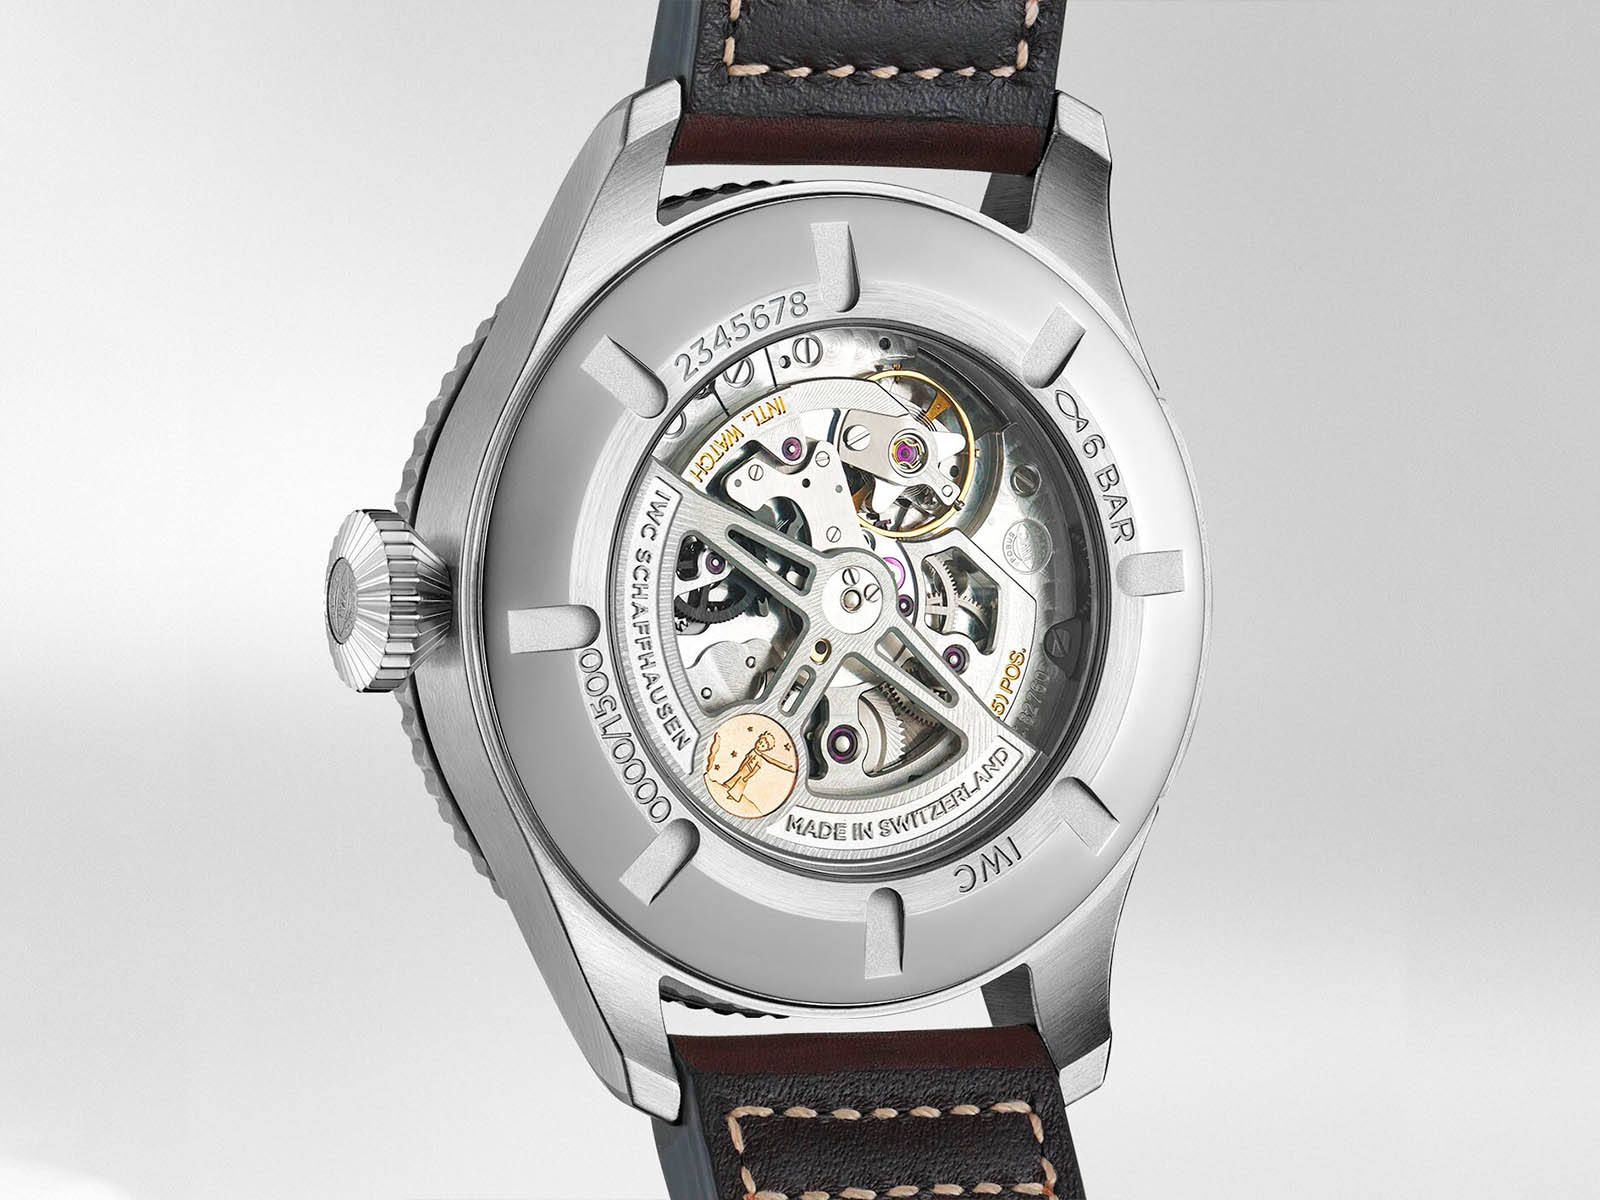 iw395503-iwc-pilot-s-watch-timezoner-edition-le-petit-prince-6.jpg